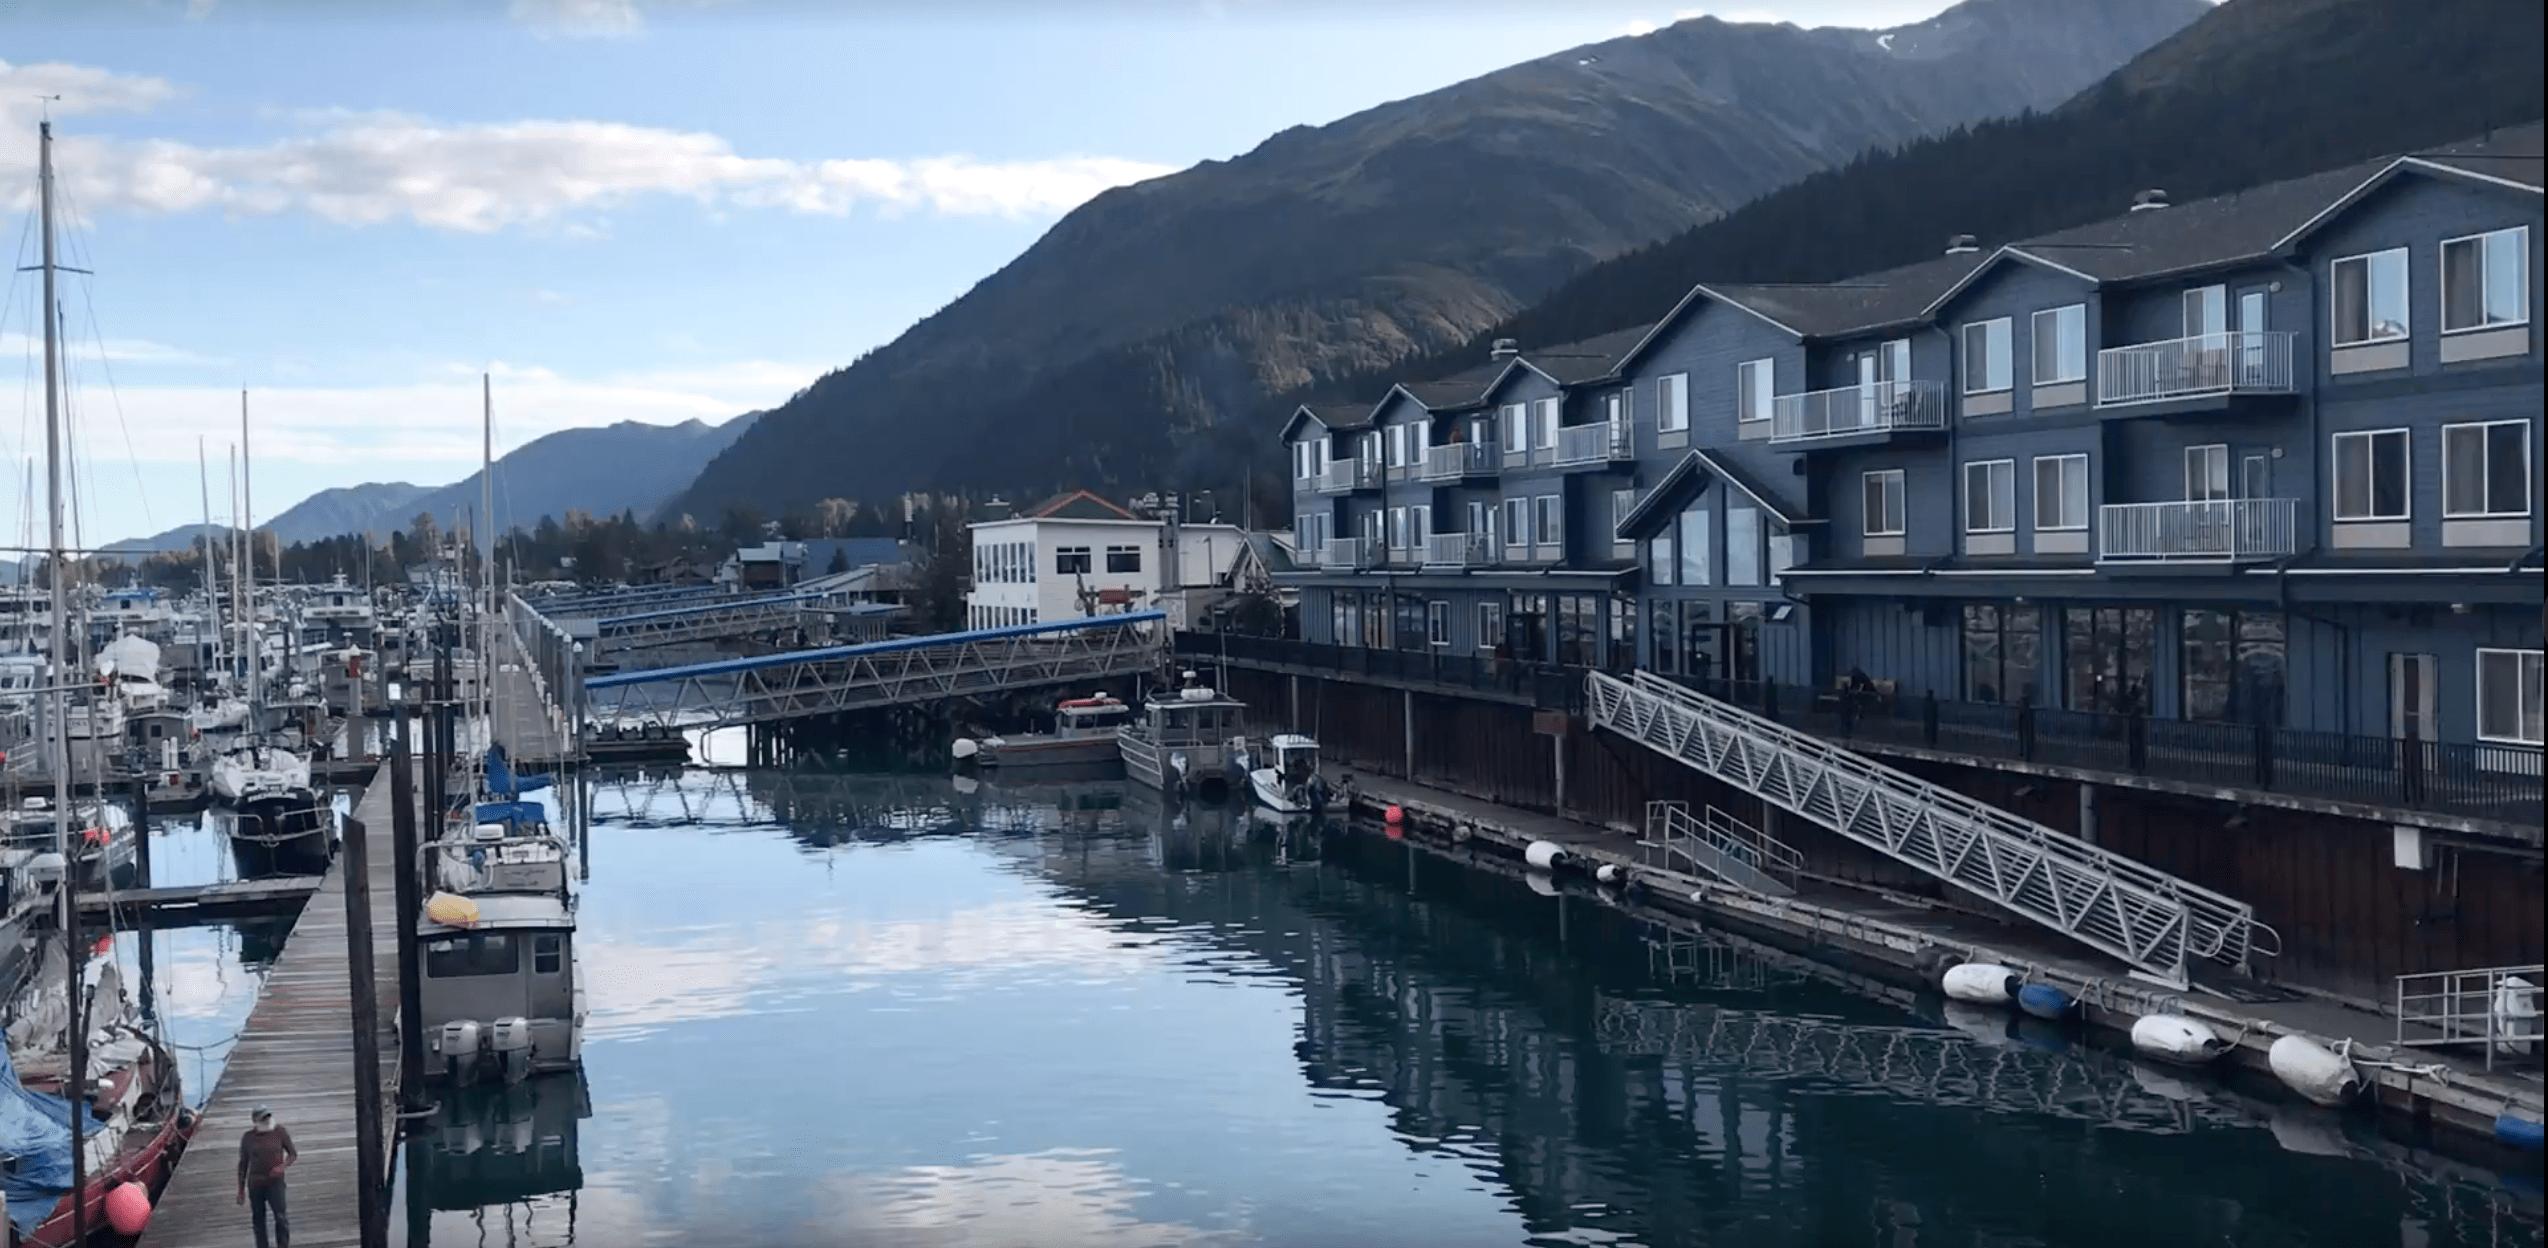 Harbor 360 Hotel in Seward, Alaska is the perfect place to stay right on the water #sewardaalaska #alaska #travelalaska